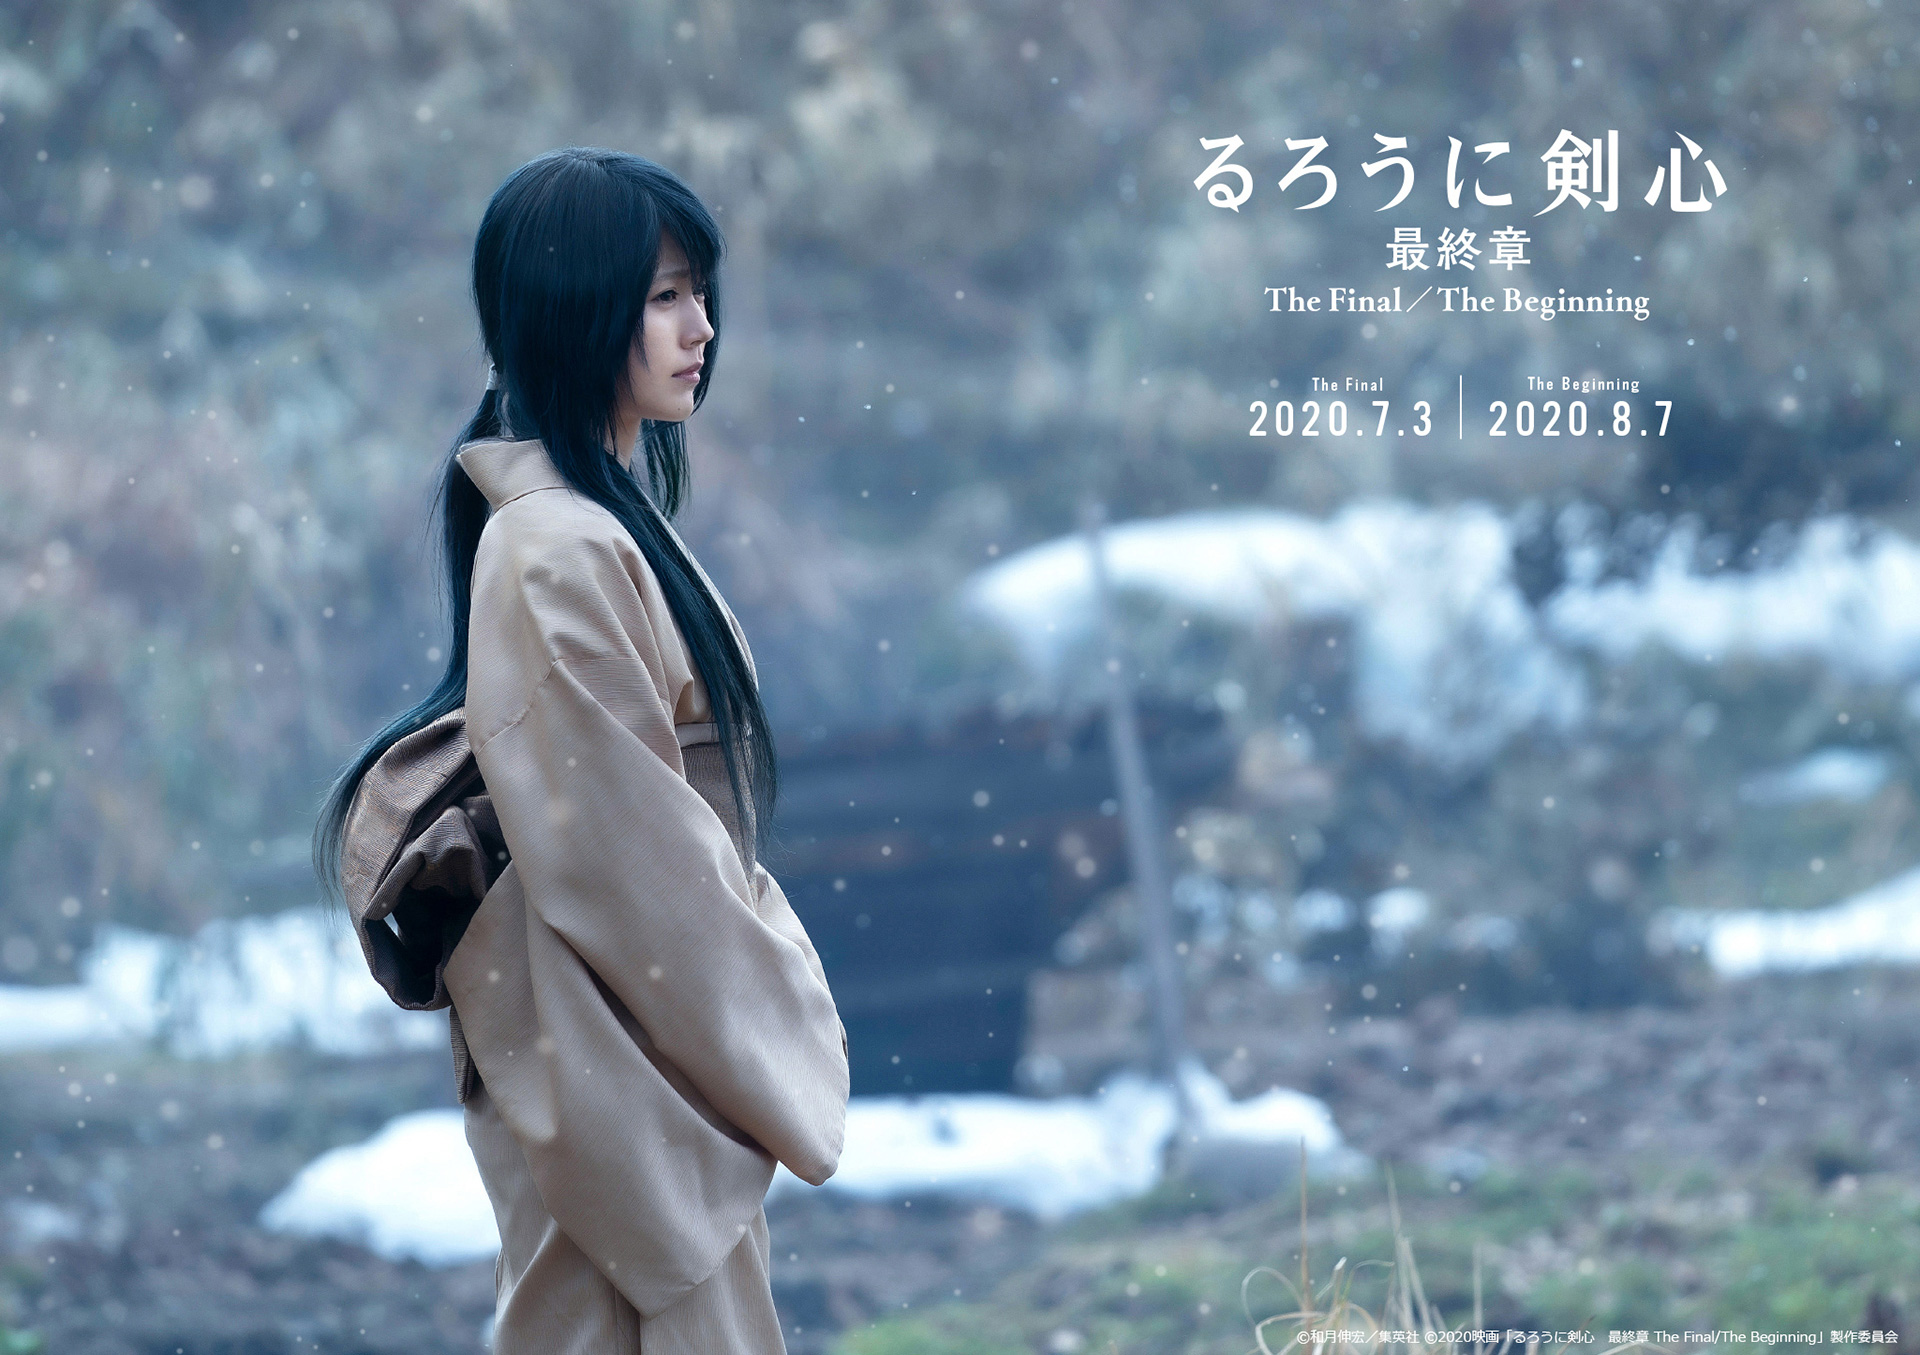 Últimos filmes live-action de Samurai X mostram Kasumi Arimura como Tomoe Yukishiro